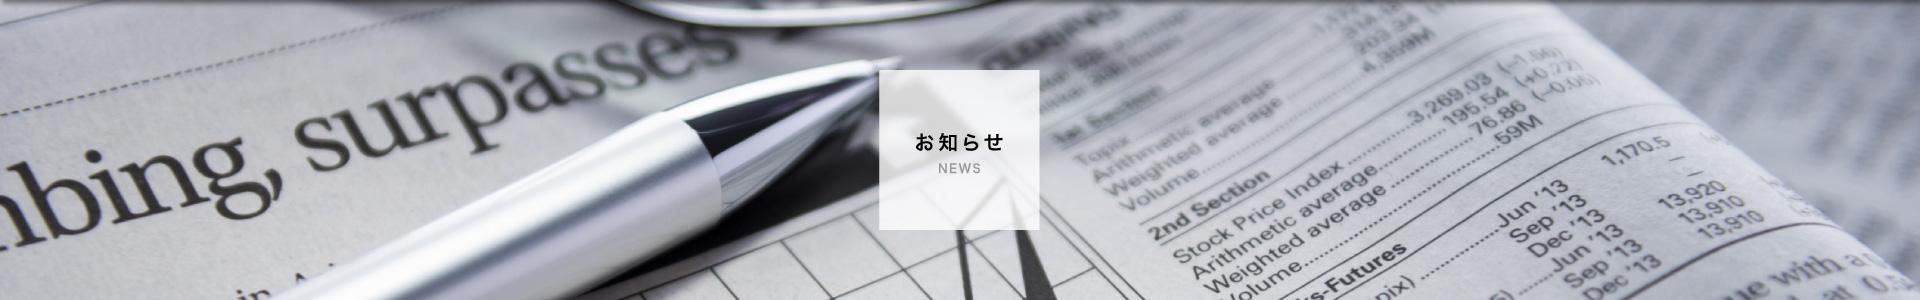 ☆☆☆OASE青柳Ⅱのオフィシャルサイトがオープン致しました。☆☆☆ 越谷市の不動産ジャストホーム